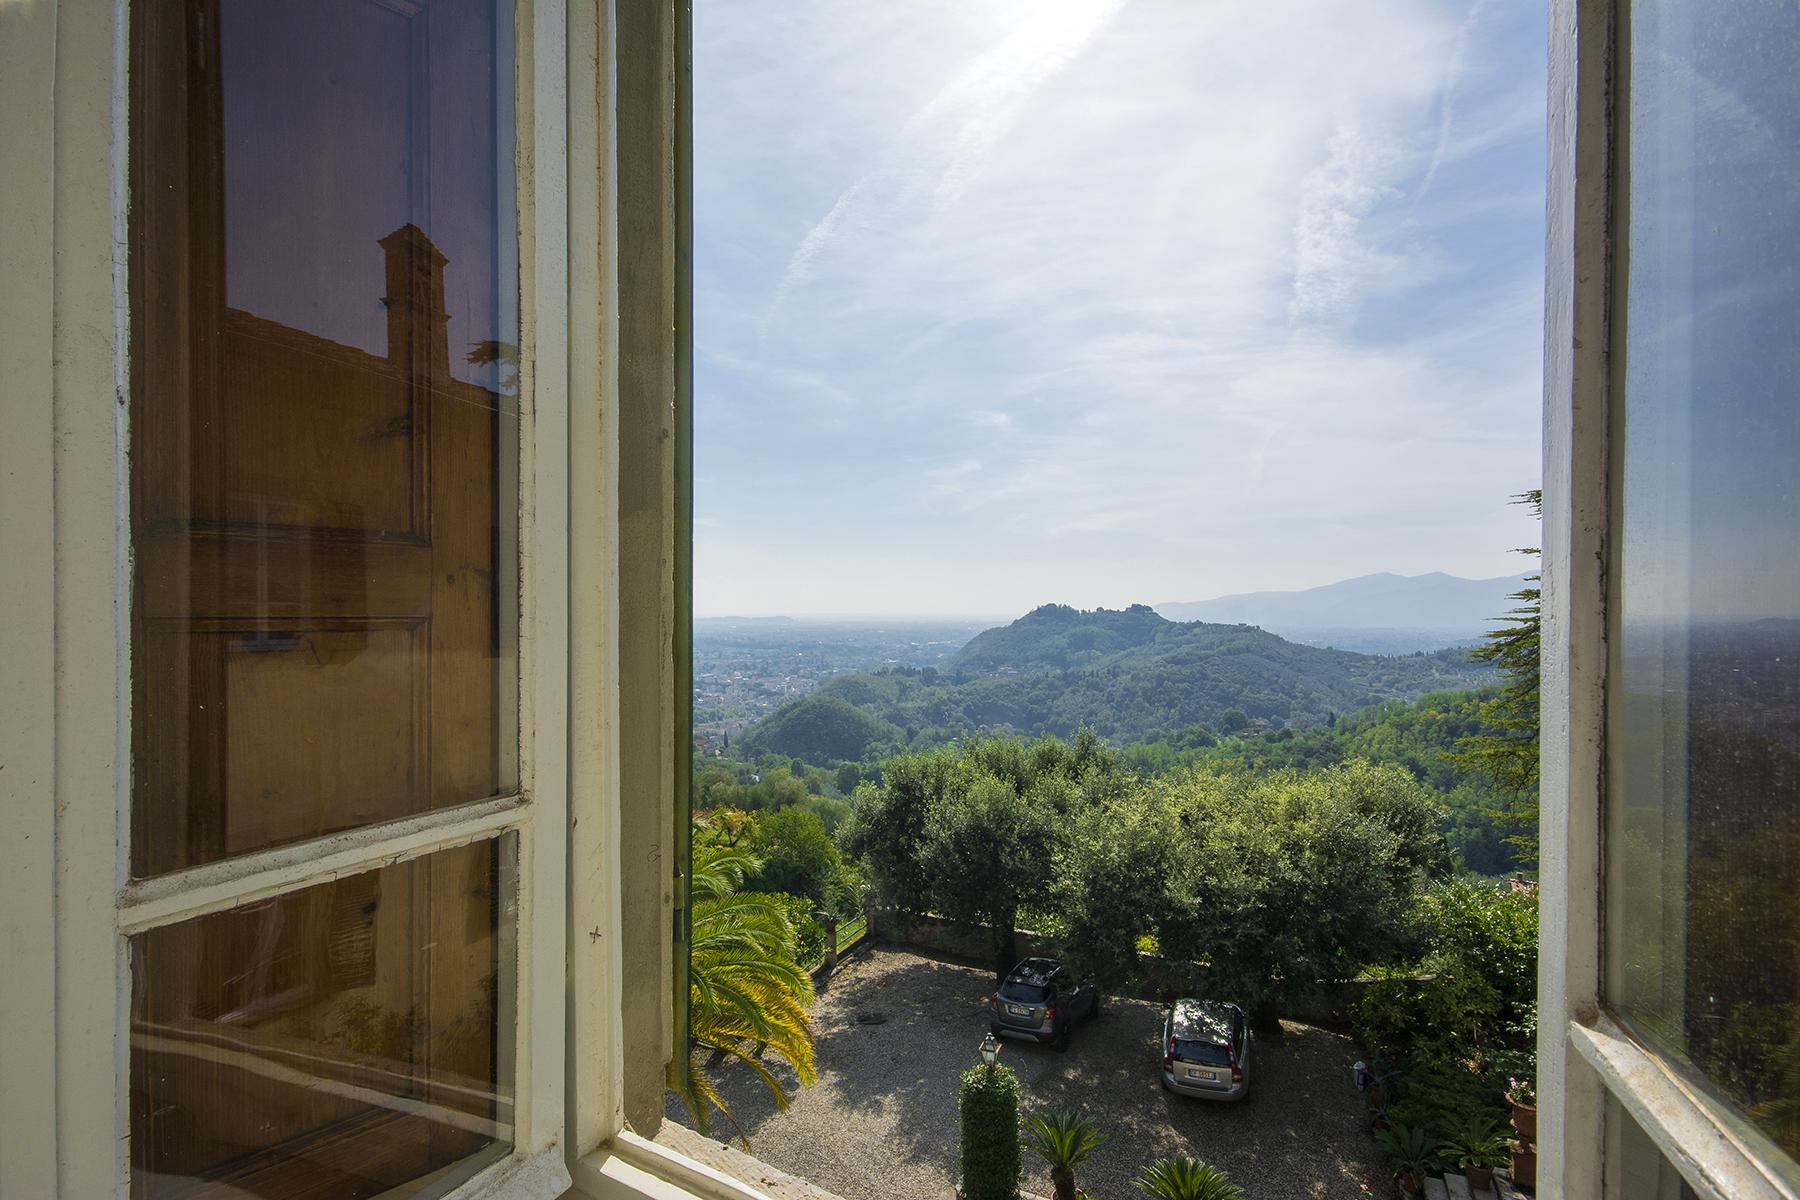 Villa in Vendita a Lucca: 5 locali, 1210 mq - Foto 15